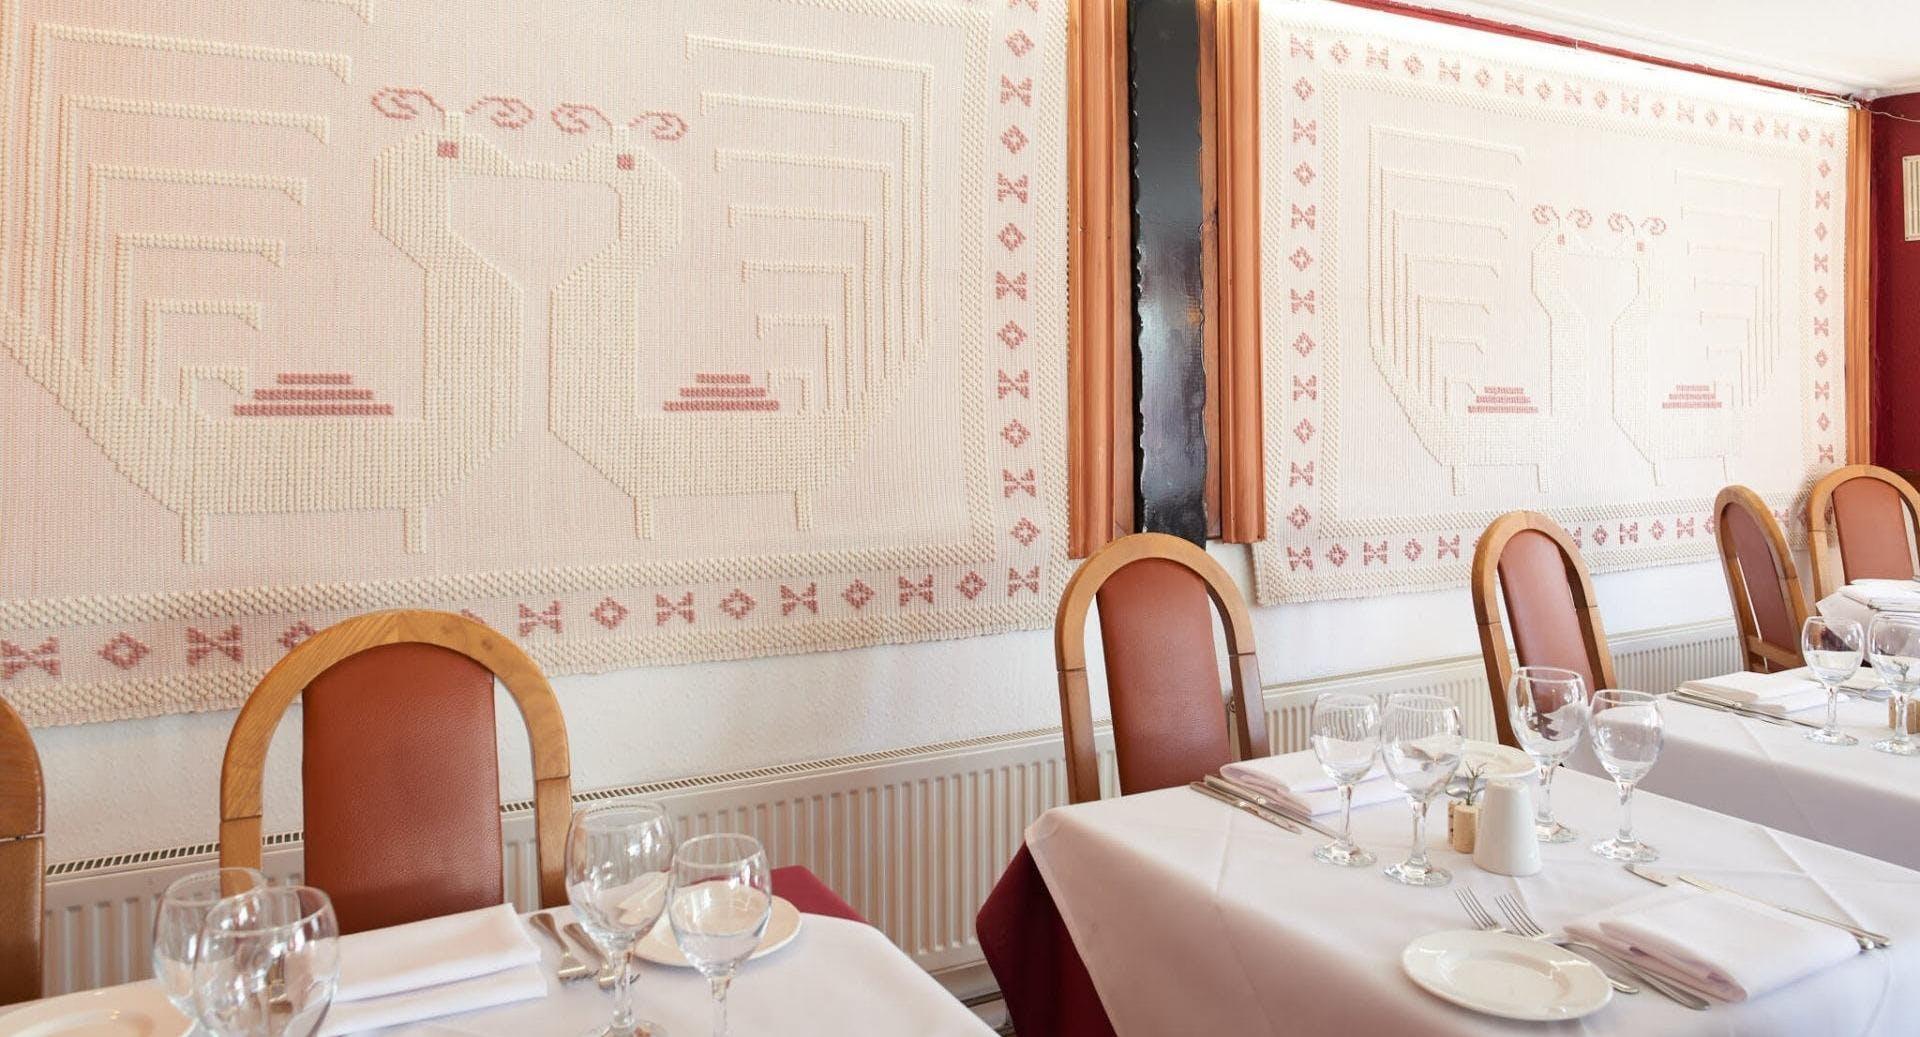 Rafayel Sardinian Restaurant Epsom image 3